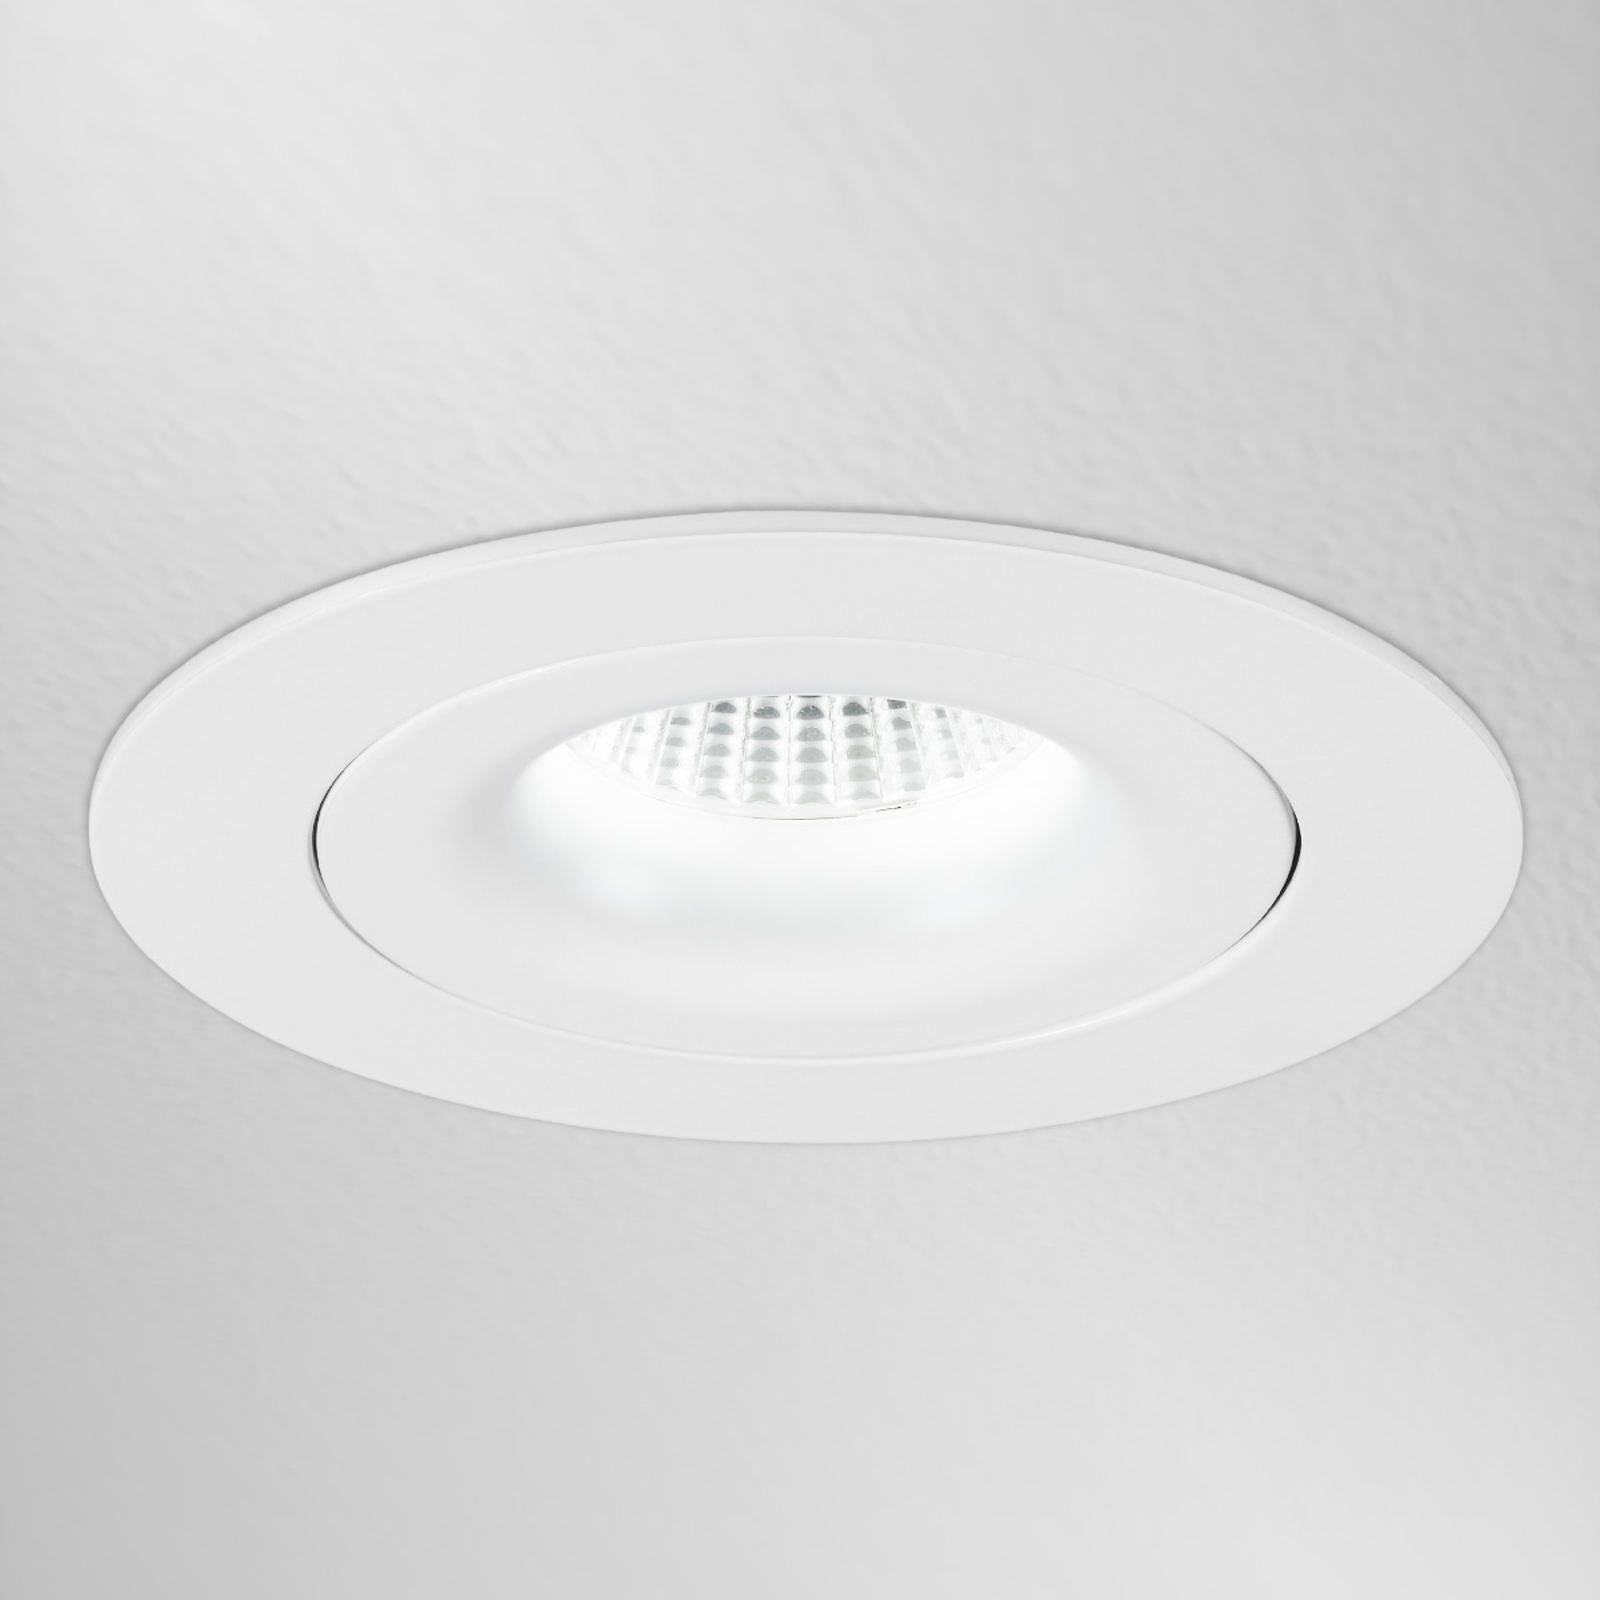 Round MK 110 LED recessed light_3023091_1